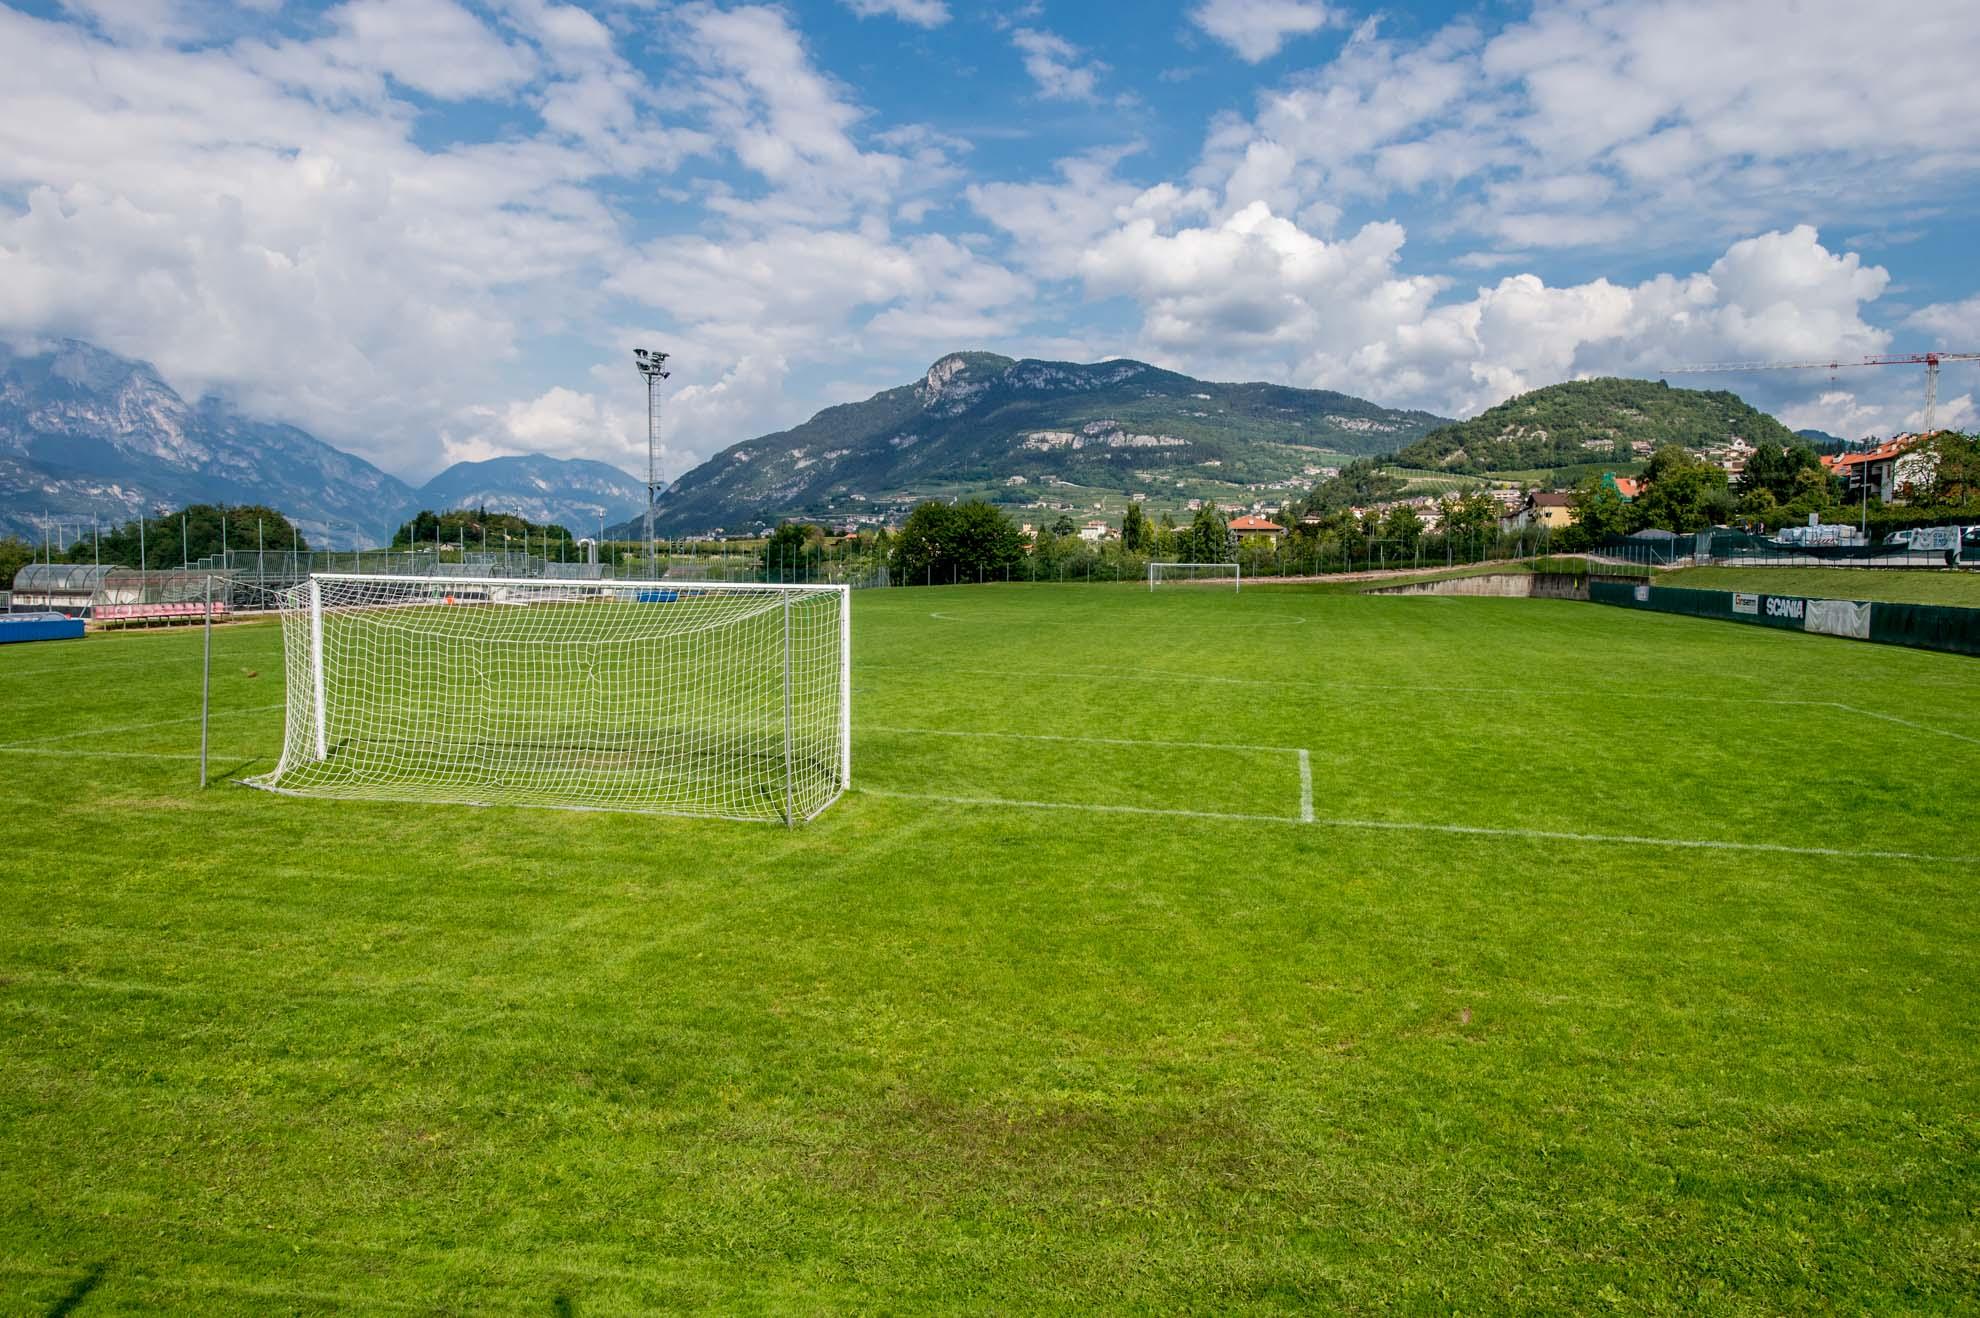 Centro sportivo gabbiolo trento info campi da calcio asis